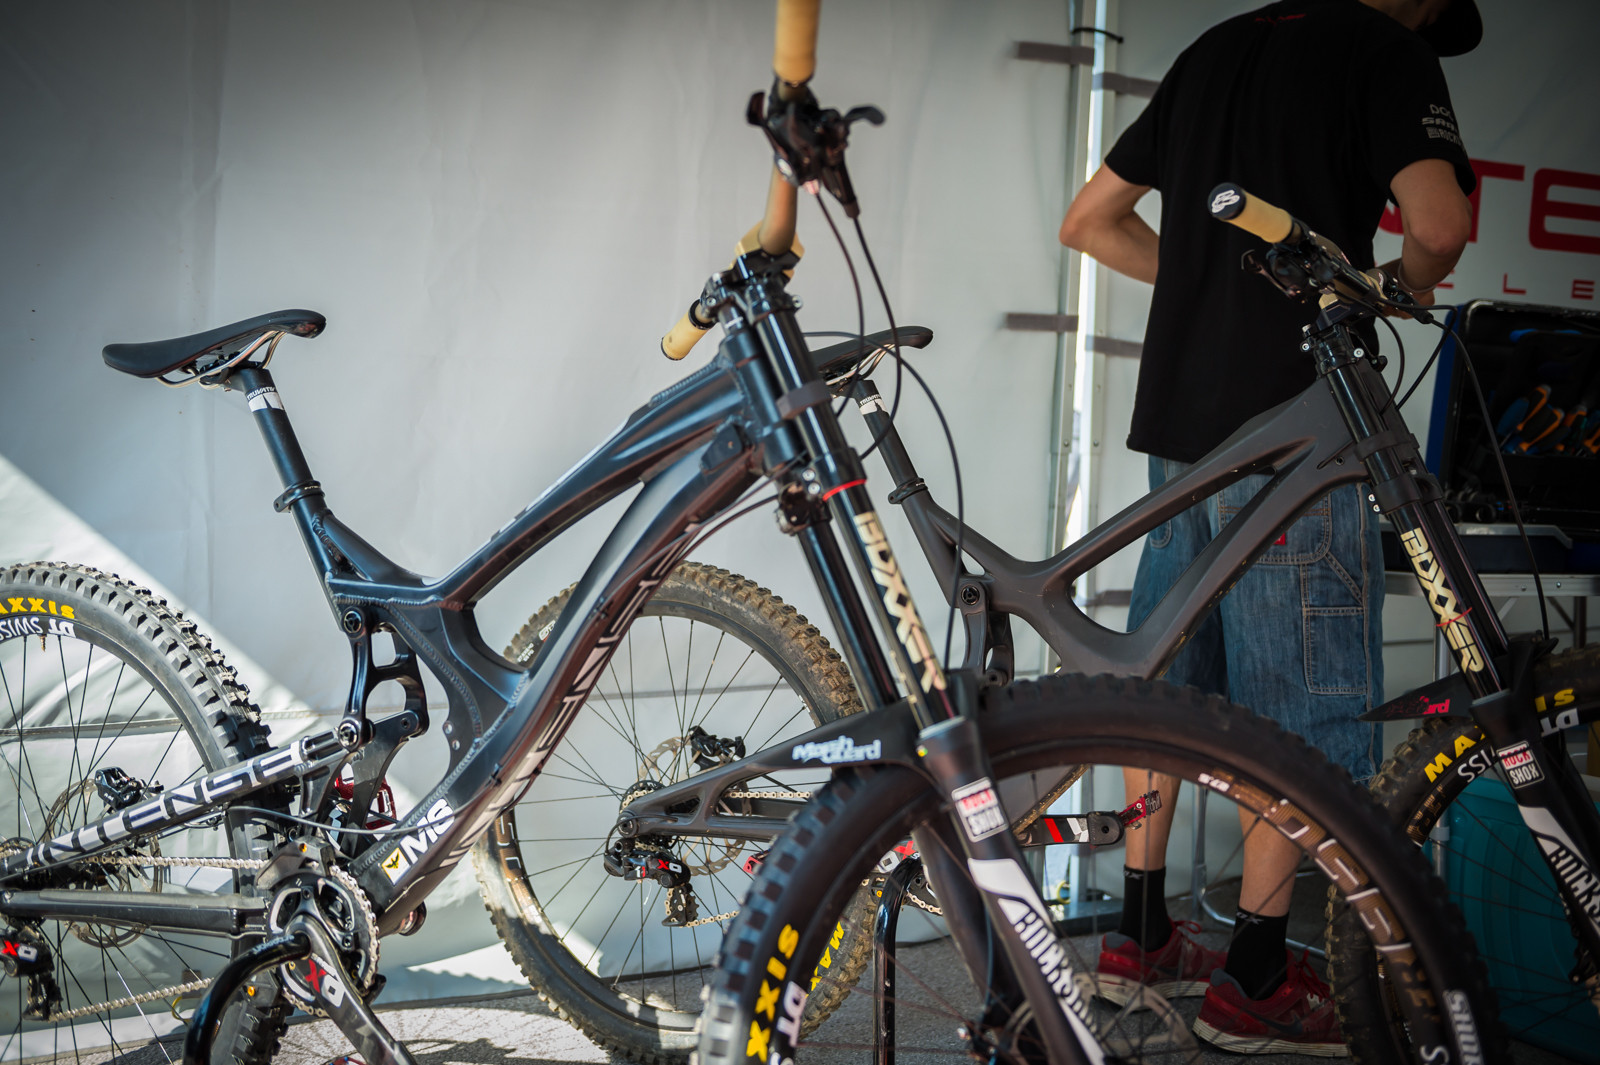 Intense Carbon M16 - PIT BITS - Leogang World Cup Downhill - Mountain Biking Pictures - Vital MTB